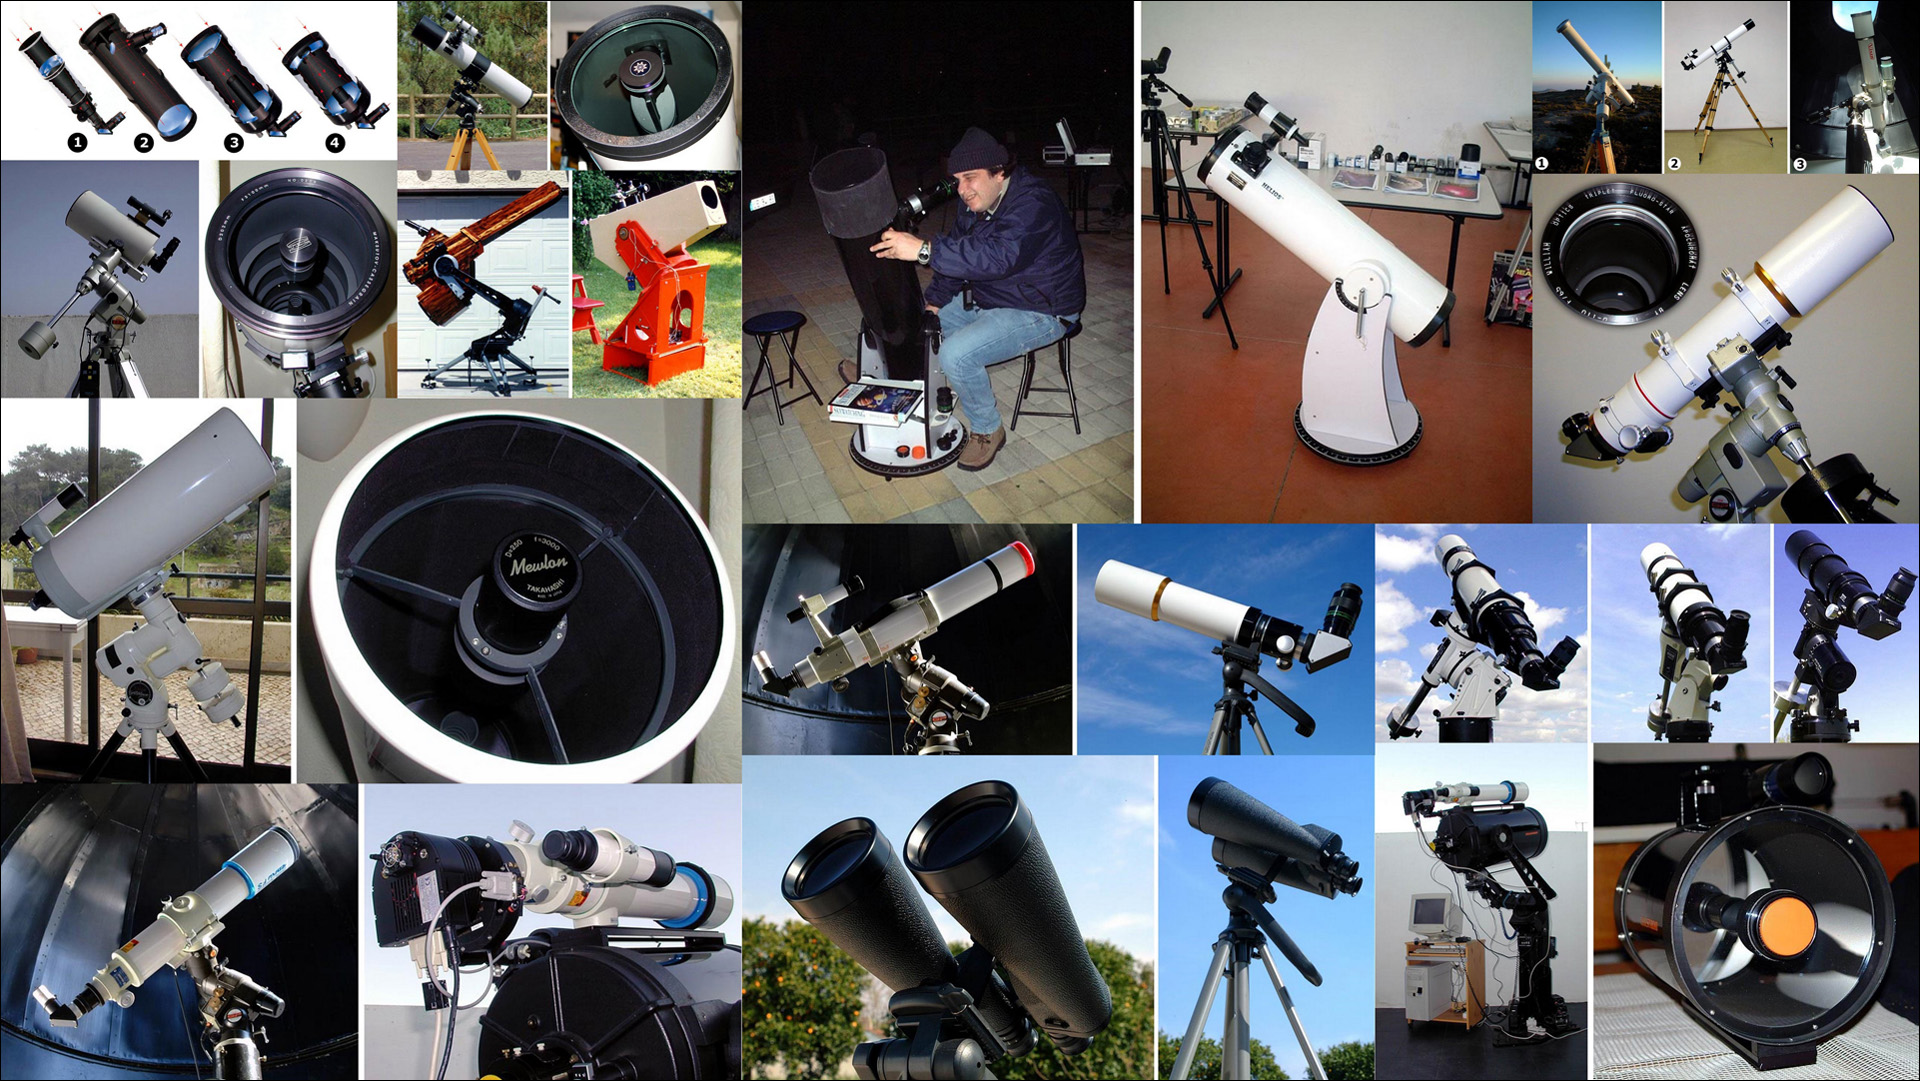 Sesto senso for schmidt cassegrain and aplanatic telescopes